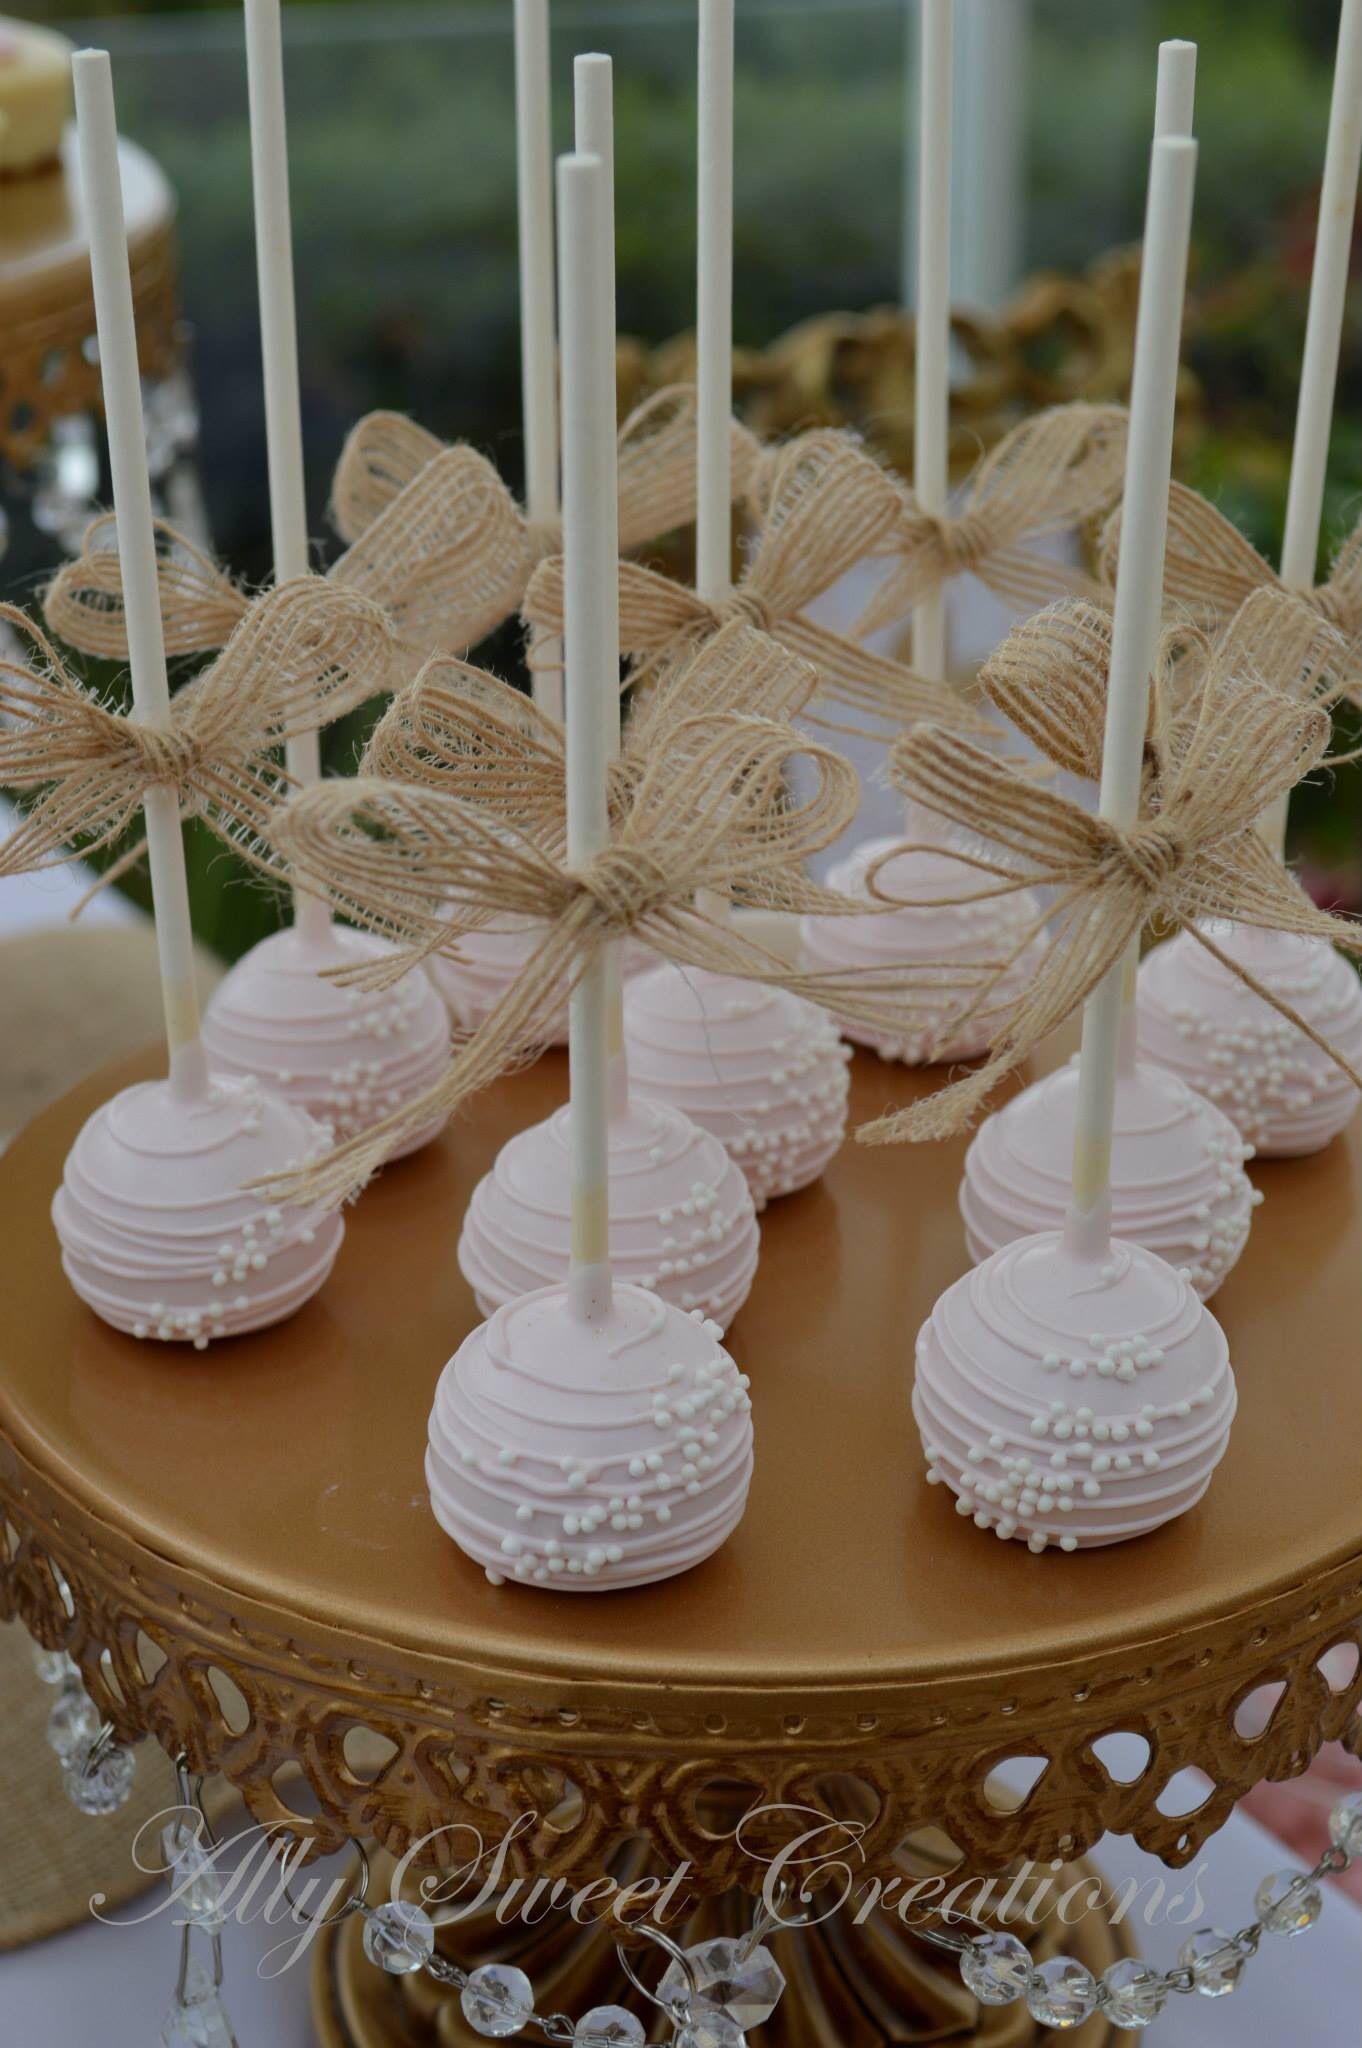 Burlap Bow Pink Cakepops Wedding Cake Rustic Wedding Cake Pops Bridal Shower Cupcakes